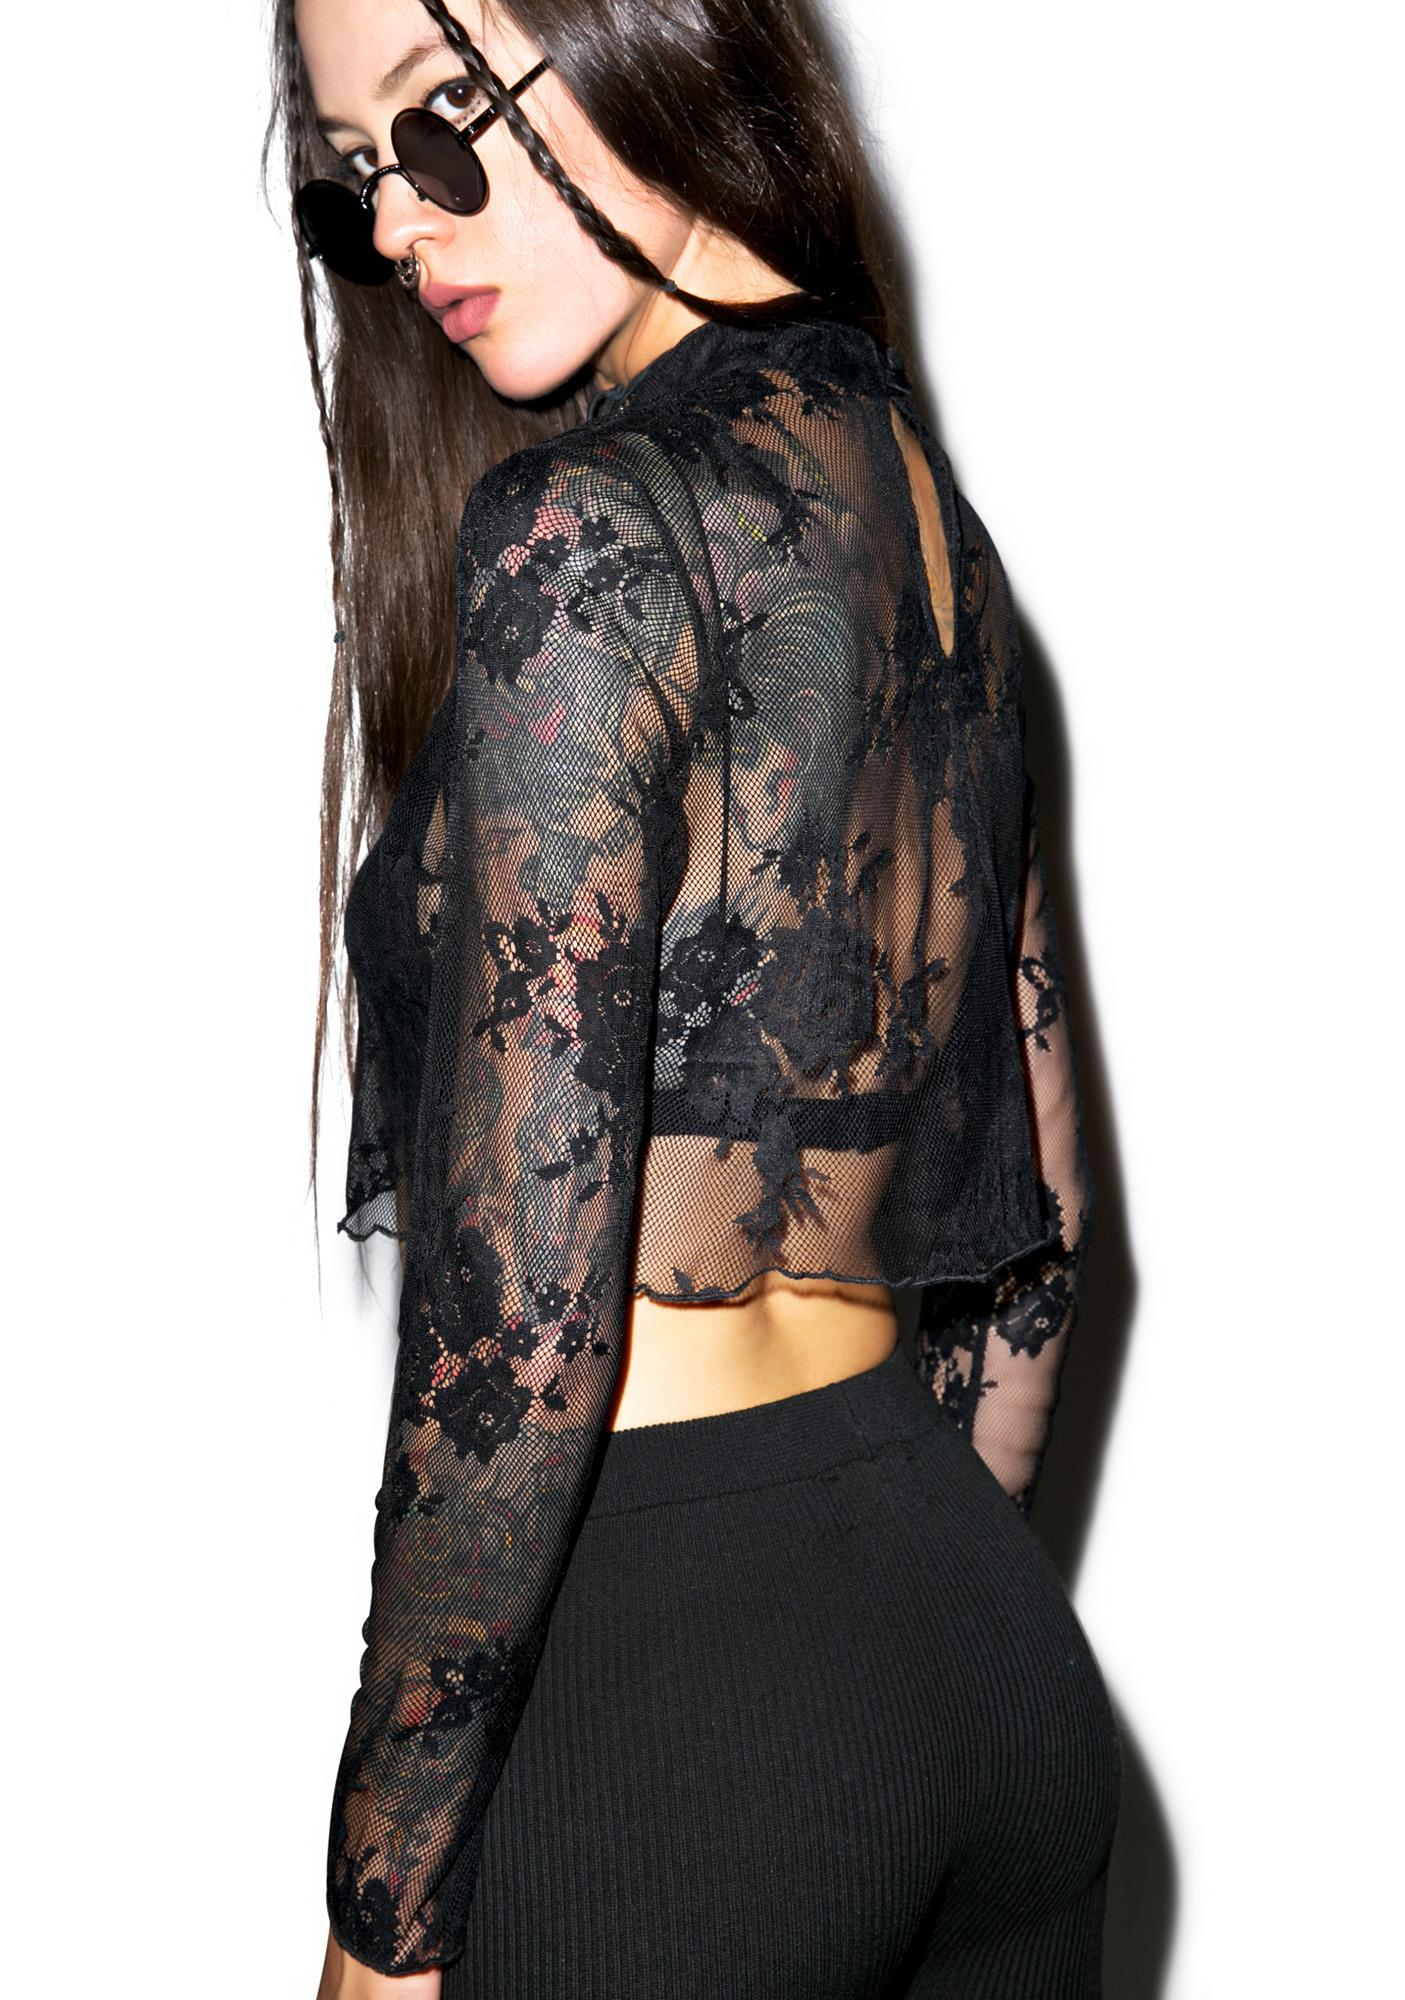 Glamorous Dark Angel Lace Crop Top